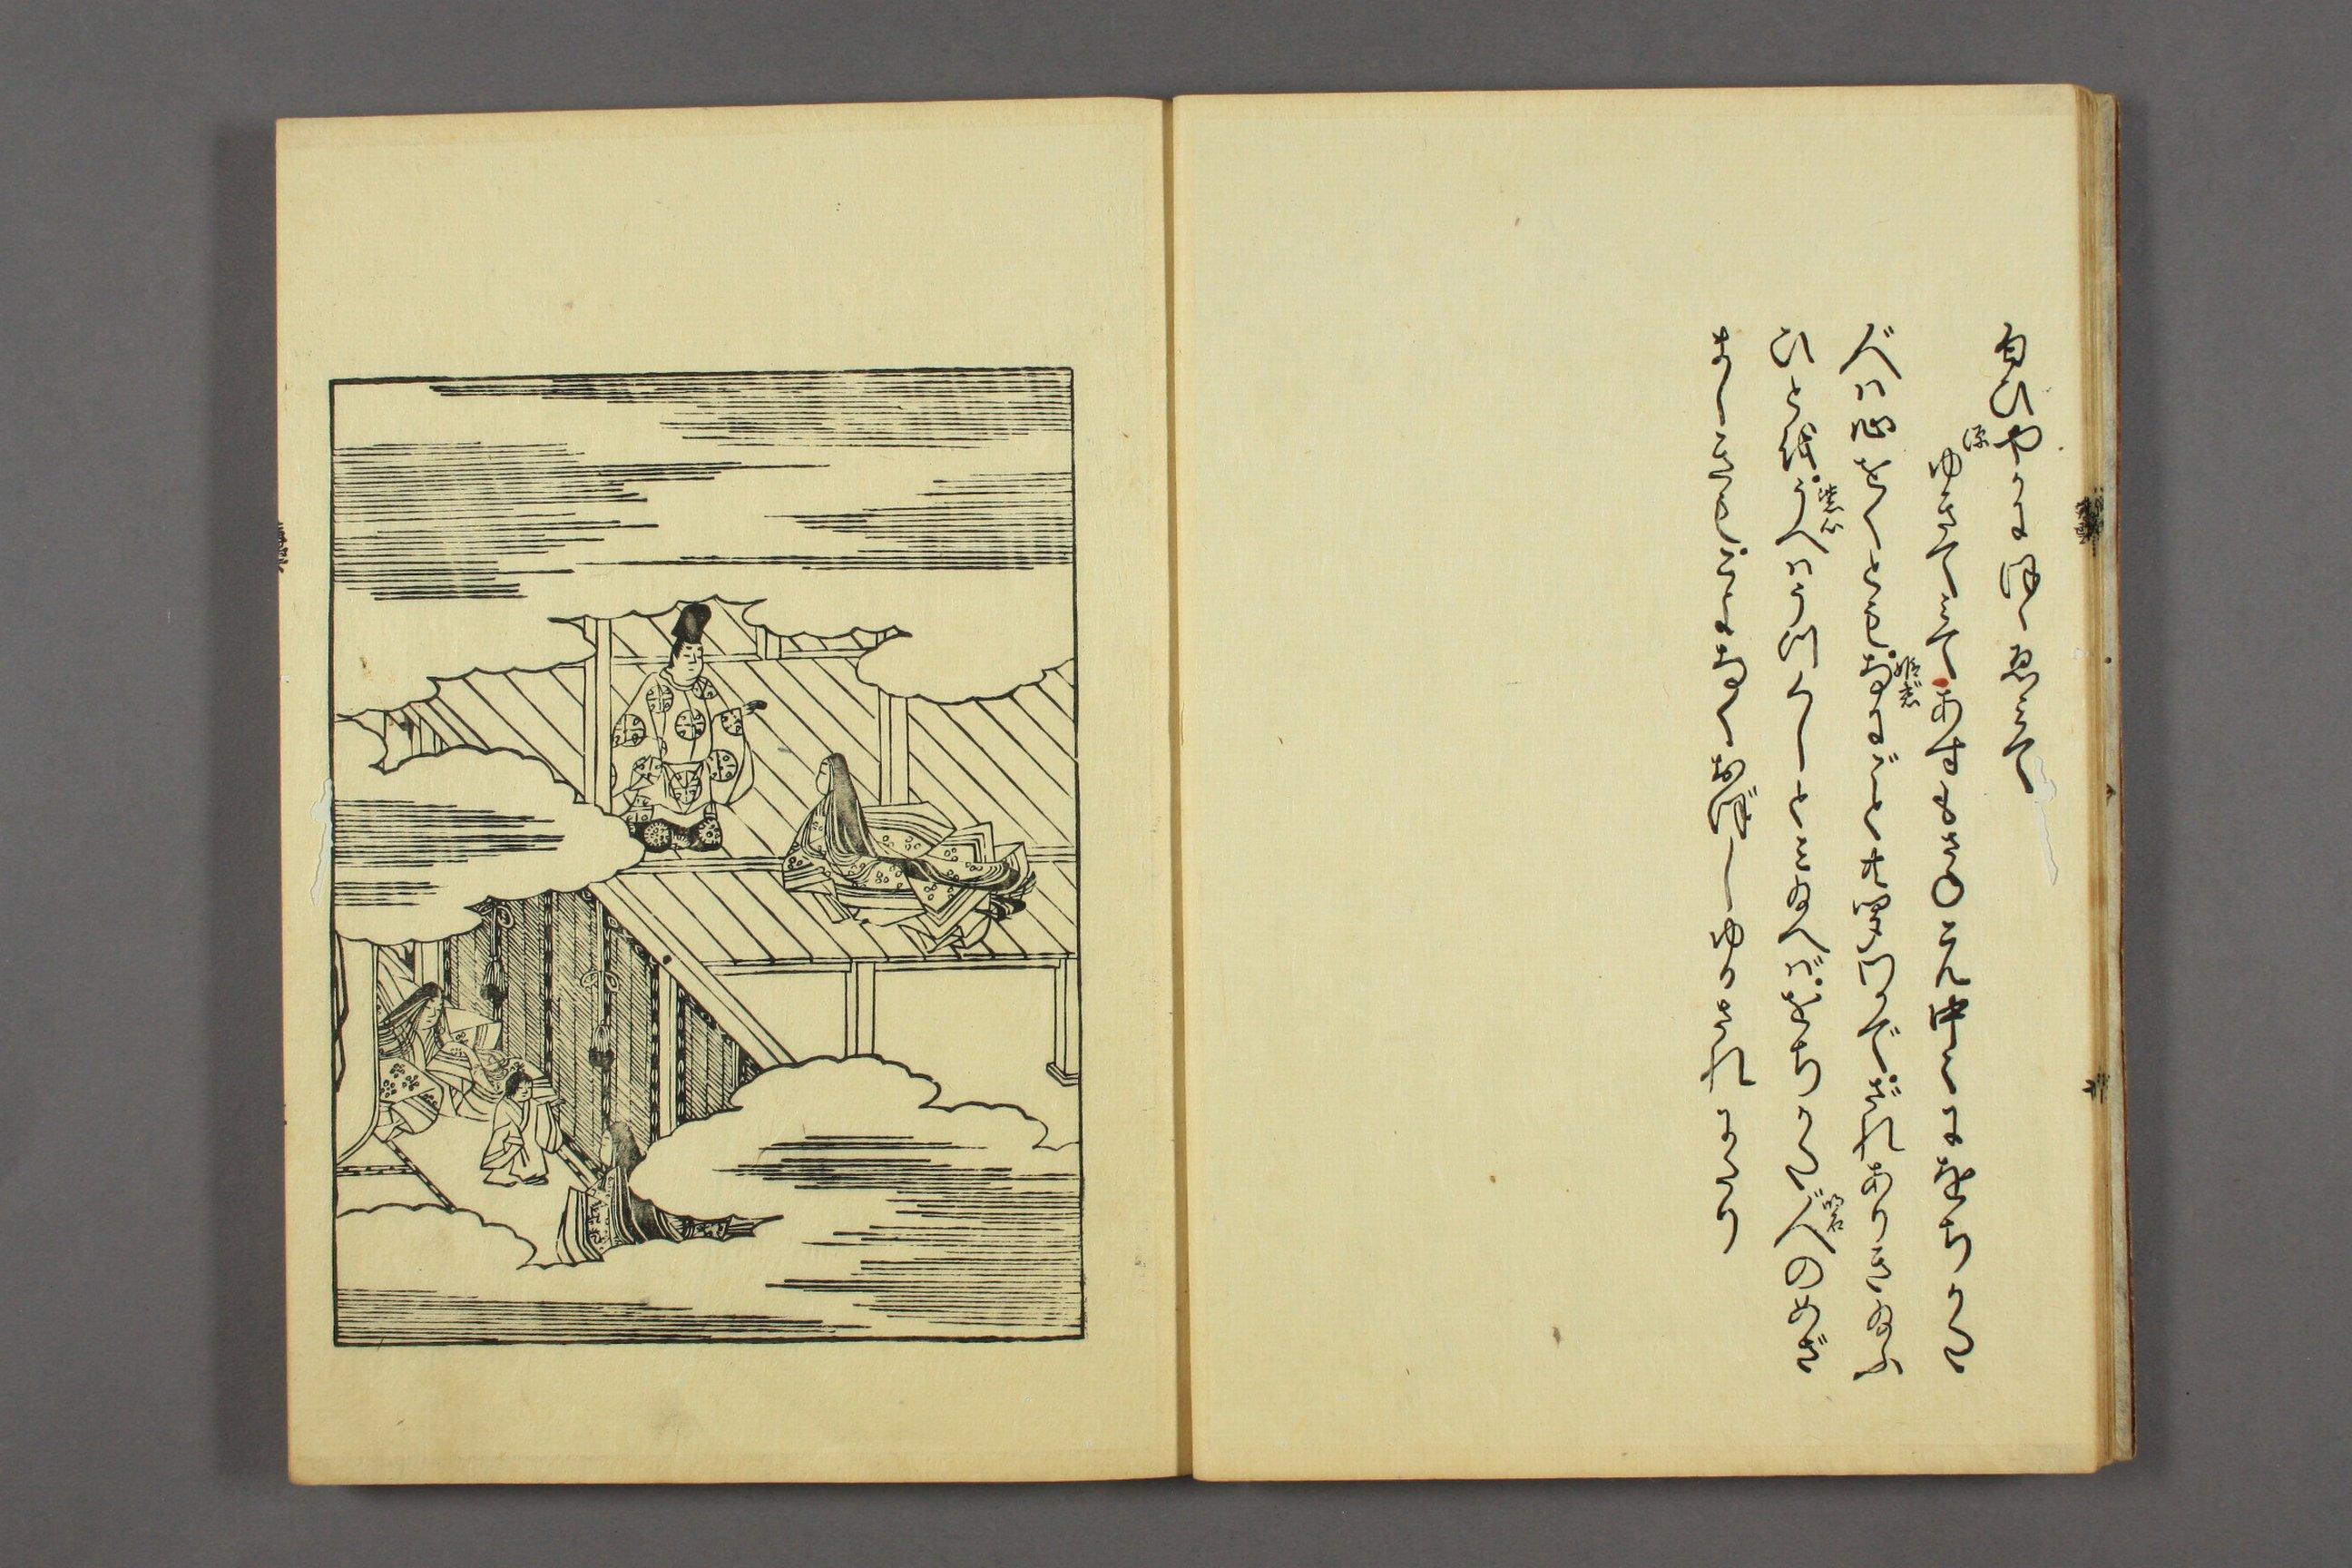 http://archive.wul.waseda.ac.jp/kosho/bunko30/bunko30_a0007/bunko30_a0007_0019/bunko30_a0007_0019_p0012.jpg